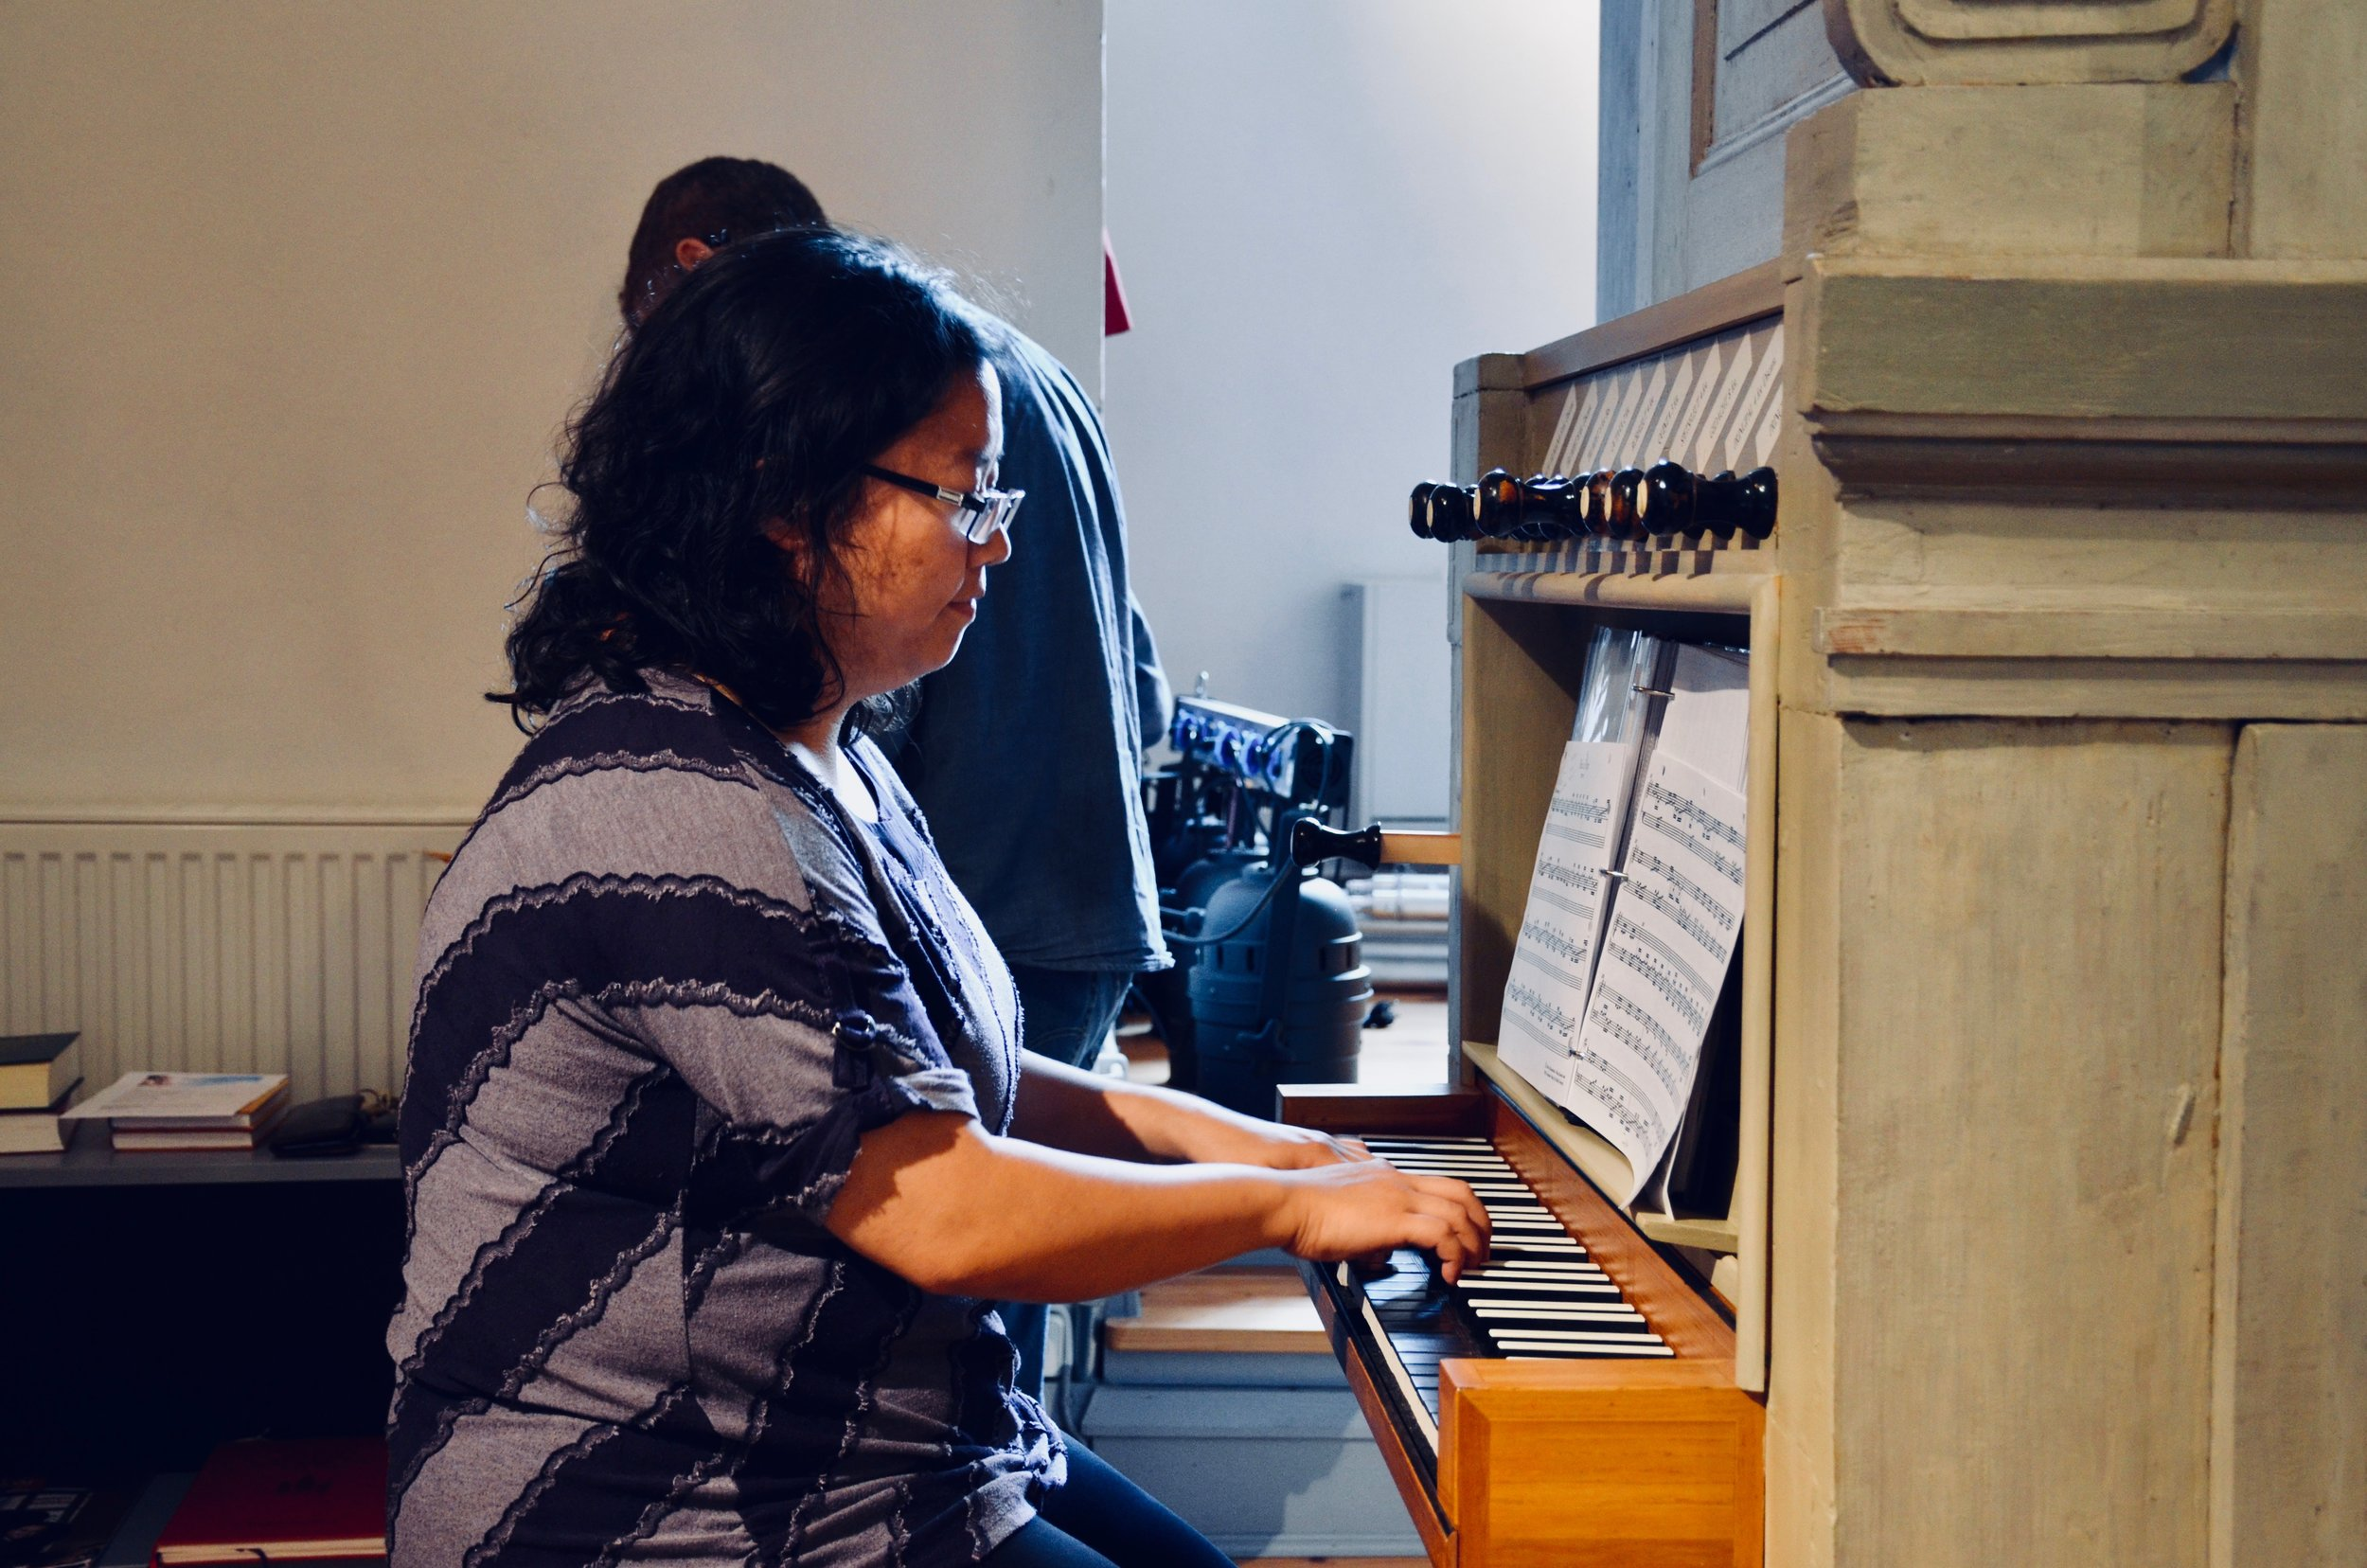 Jennifer Hsiao plays the 1783 Schiörlin organ in Jonsered, Sweden.